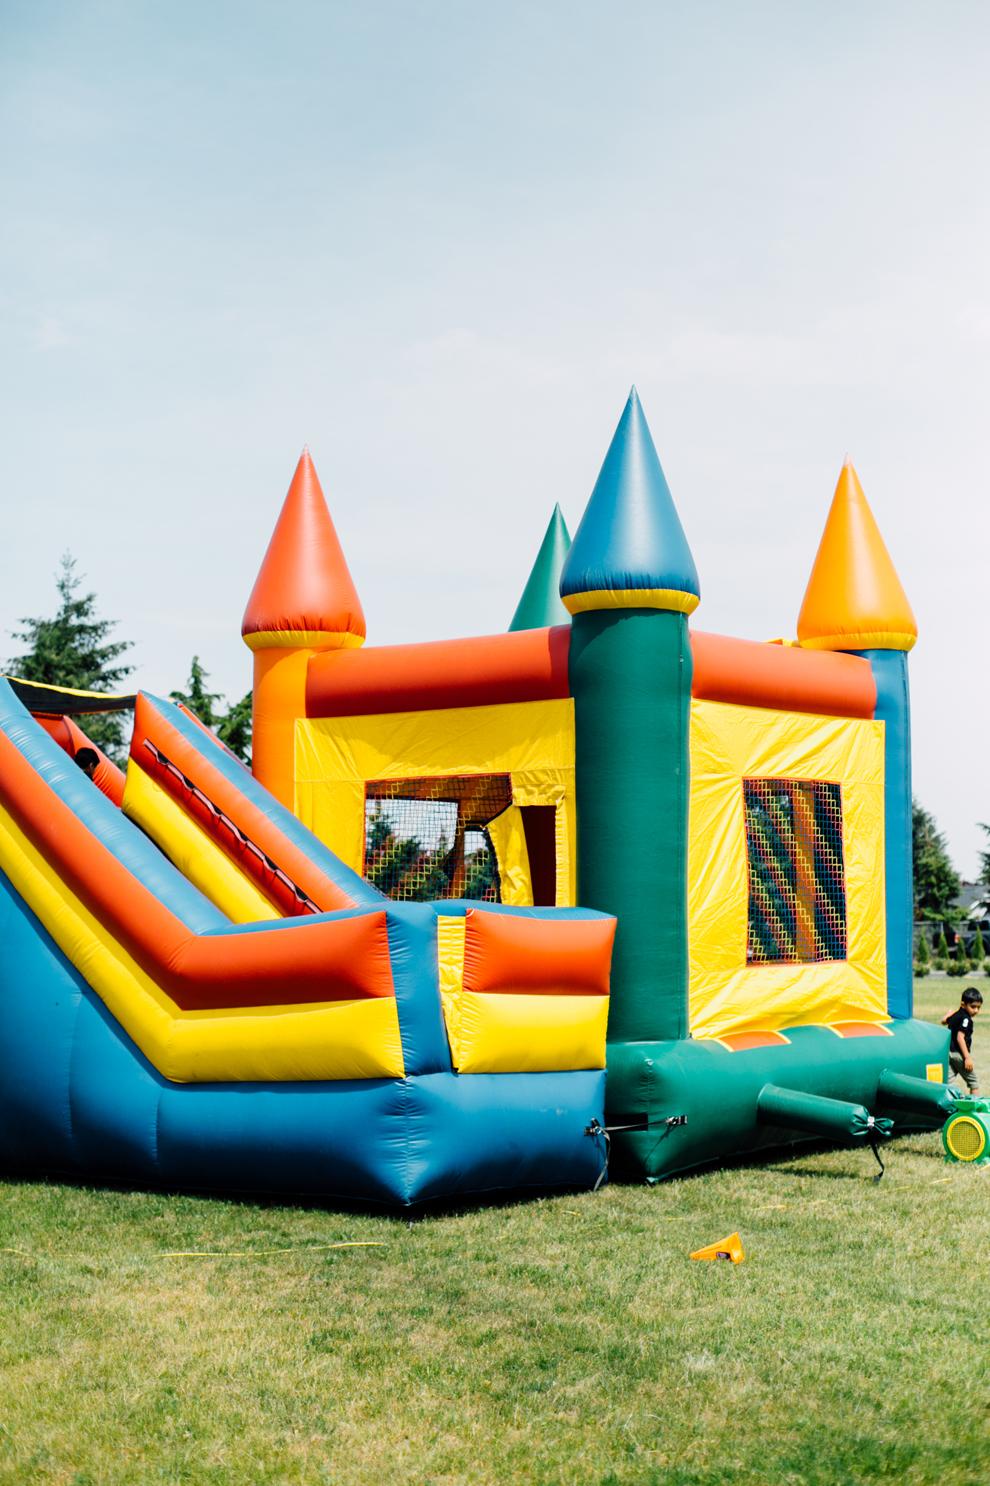 014-one-year-birthday-party-event-photography-lynden-bellingham-katheryn-moran-mira.jpg